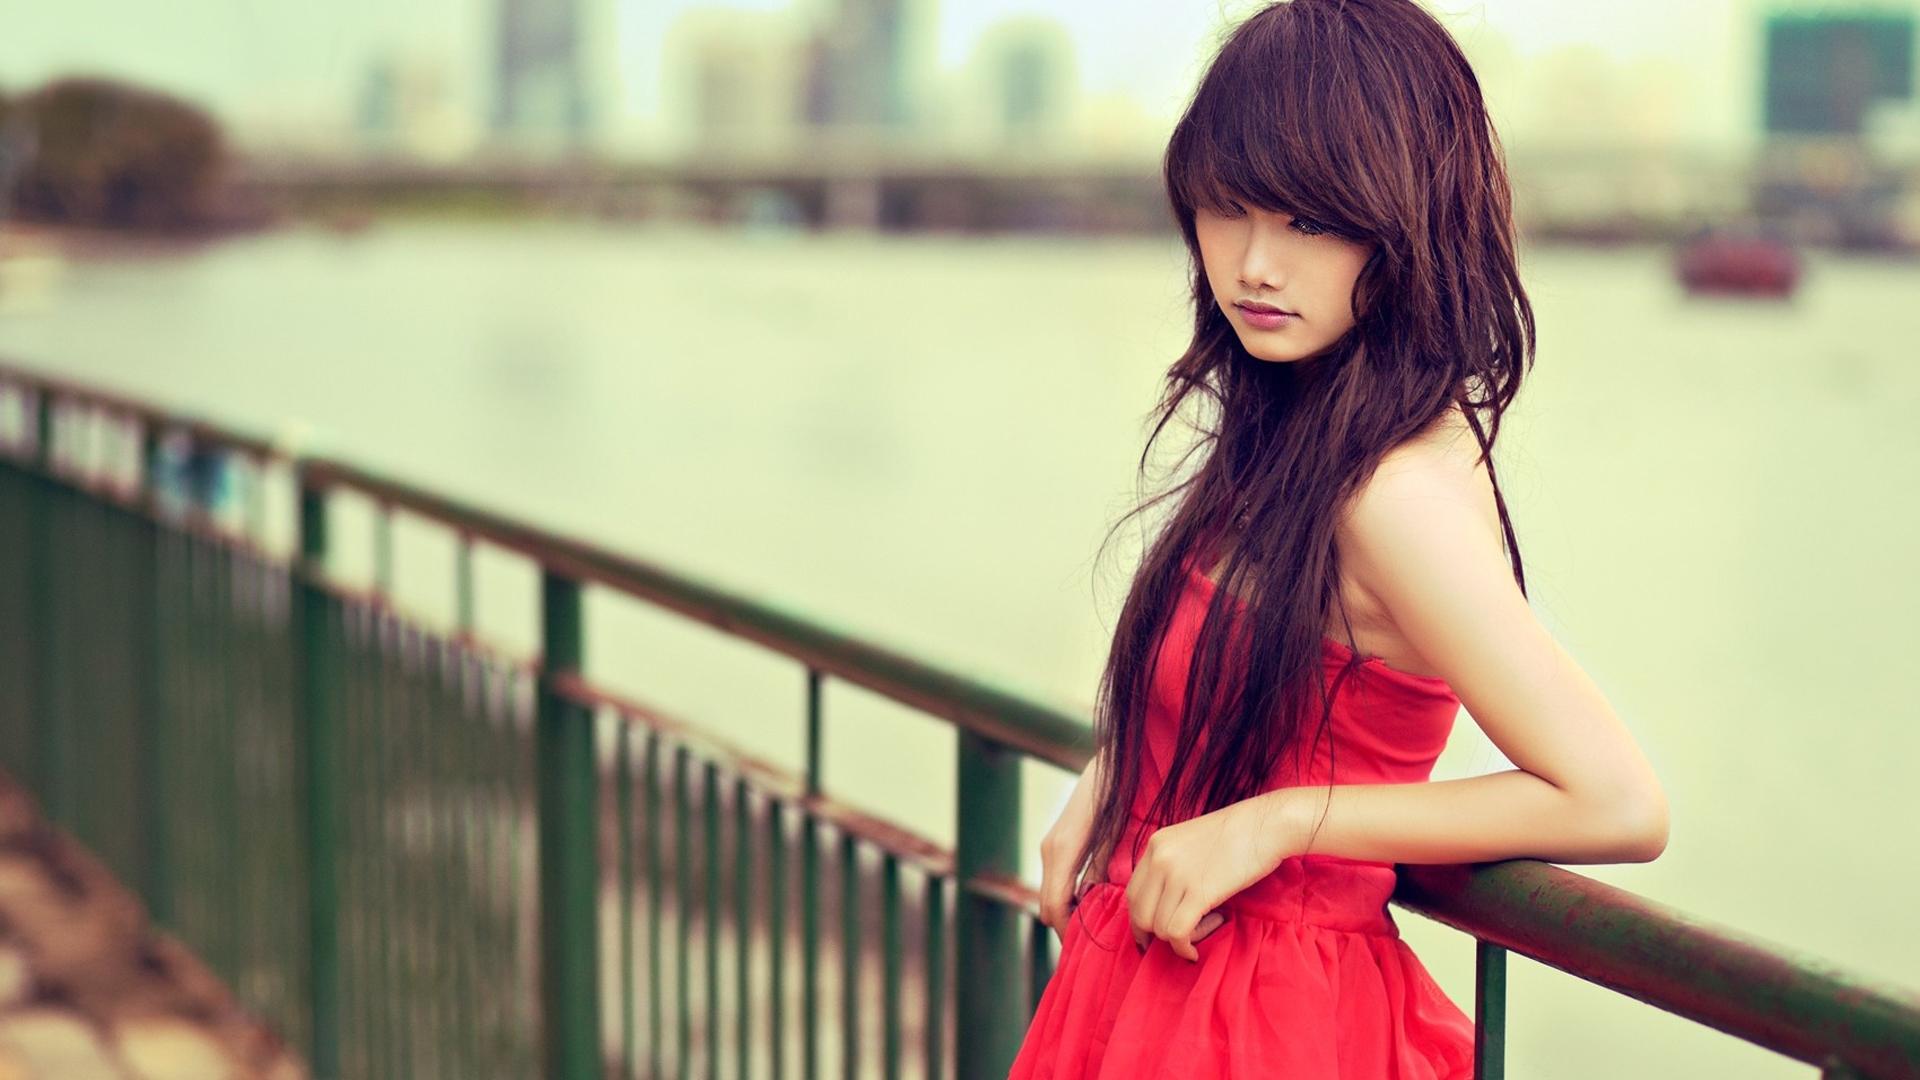 Donne - Oriental  Woman Girl Sfondo